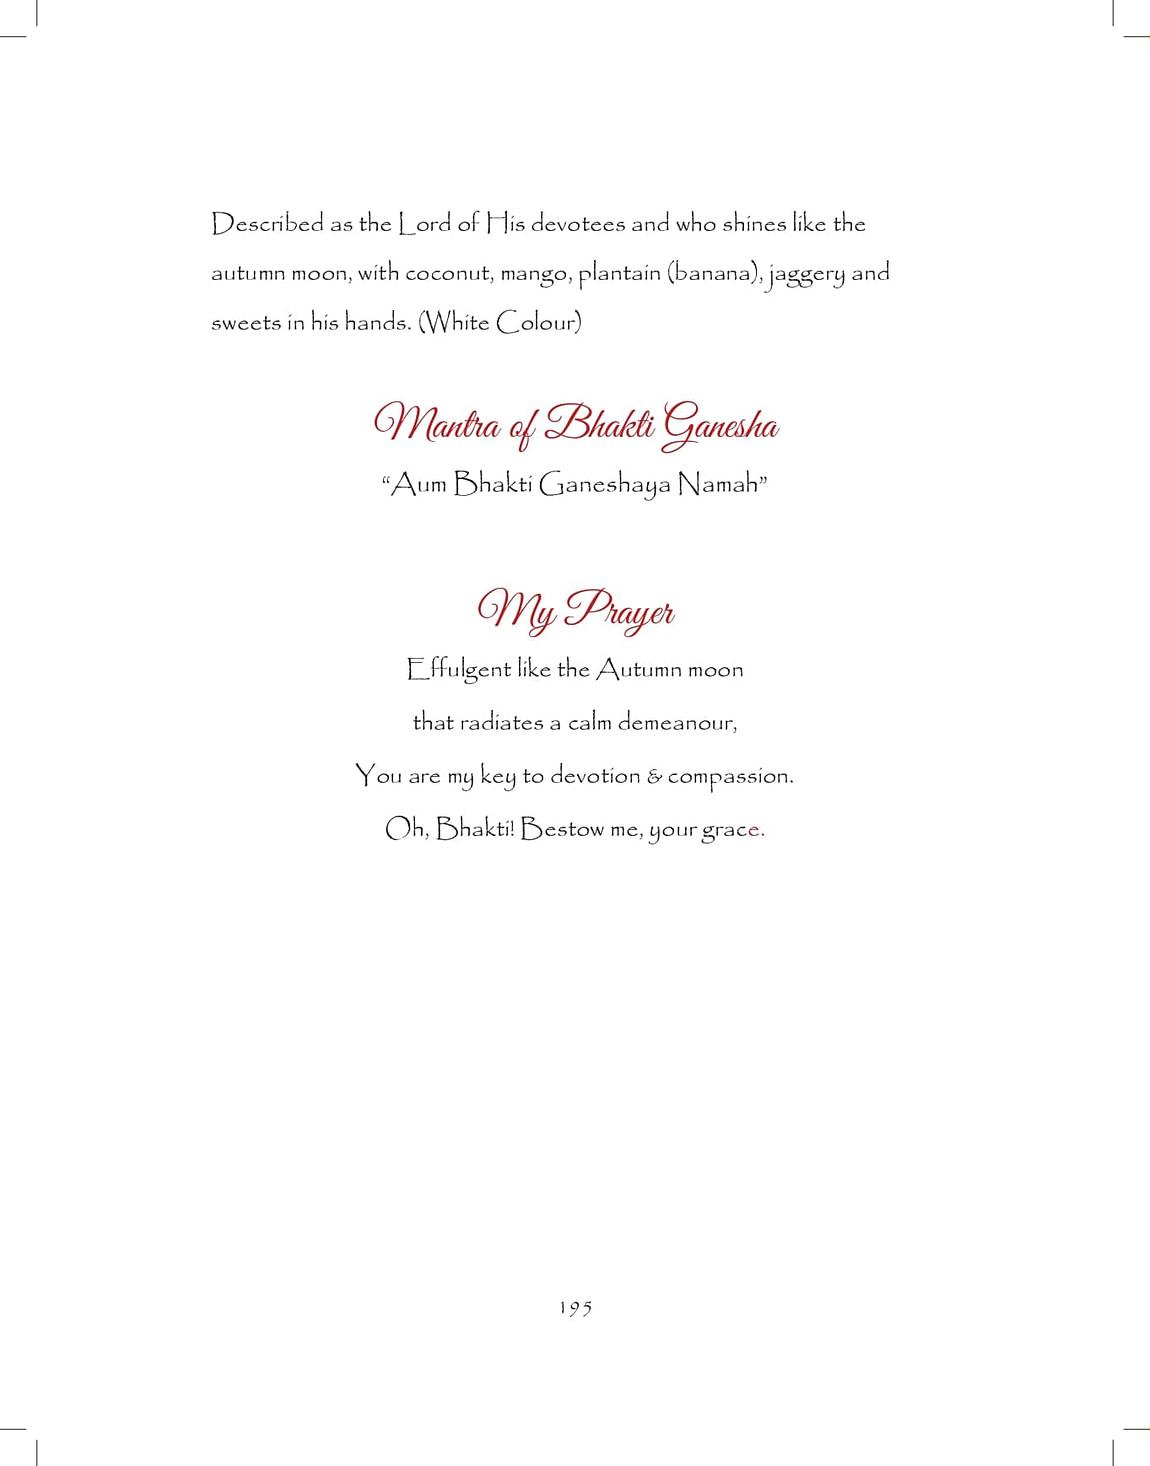 Ganesh-print_pages-to-jpg-0195.jpg